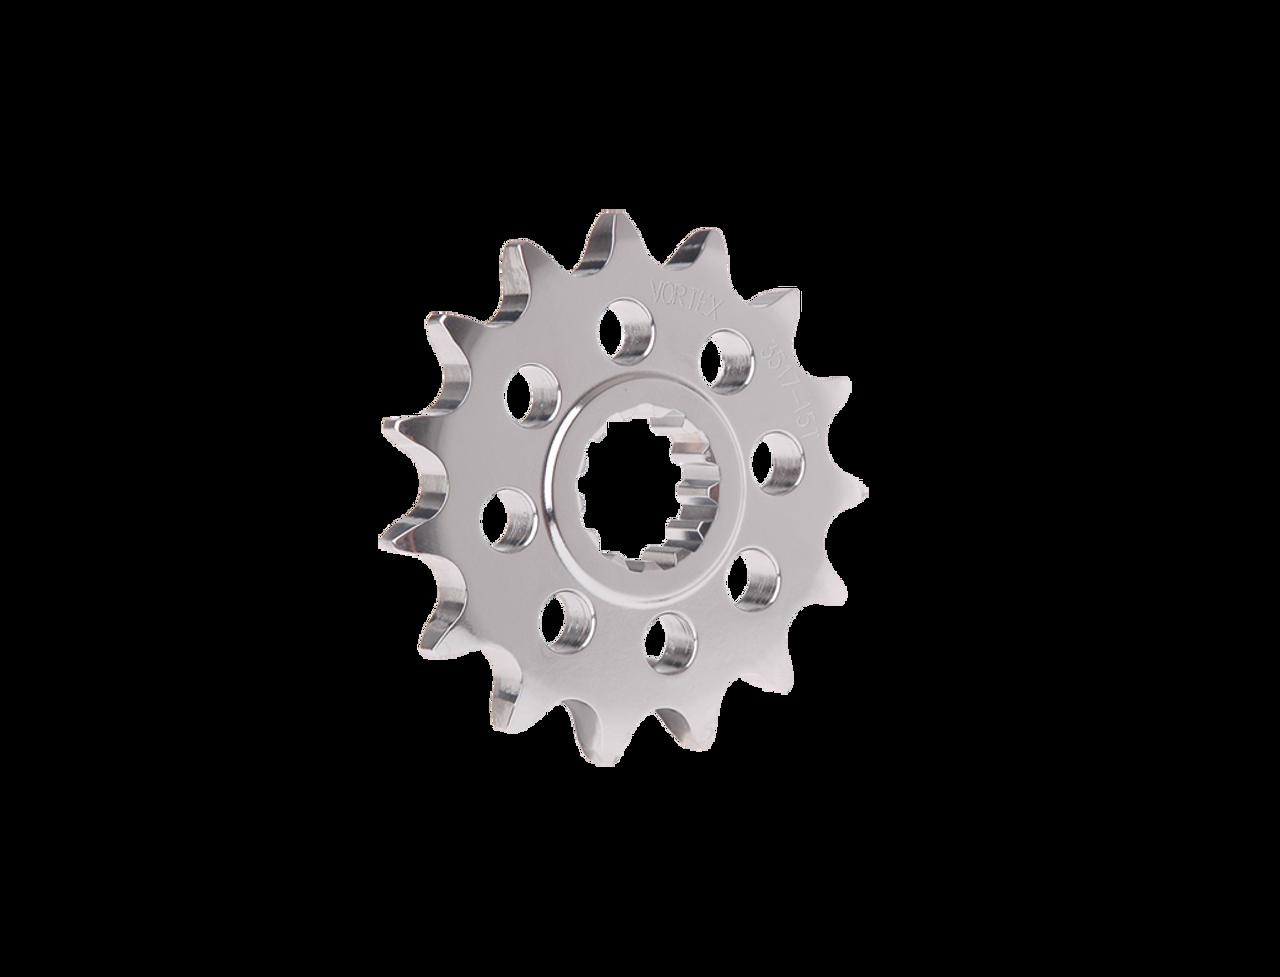 Vortex Sprocket Silver Aluminum Front 3521